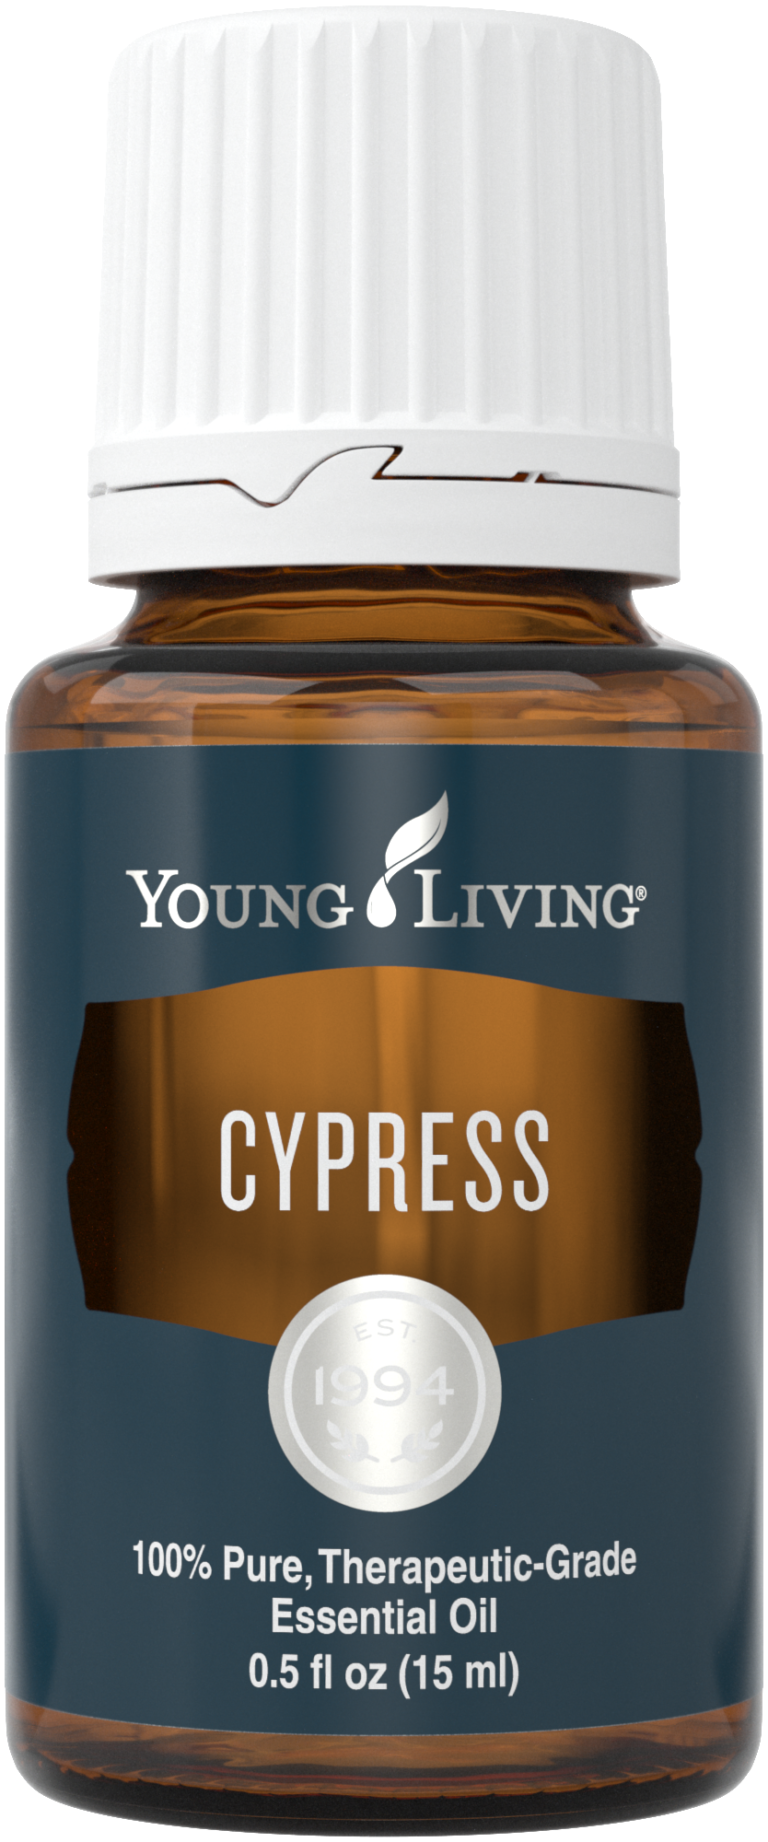 cypress_15ml_silo_us_2016_23899142064_o